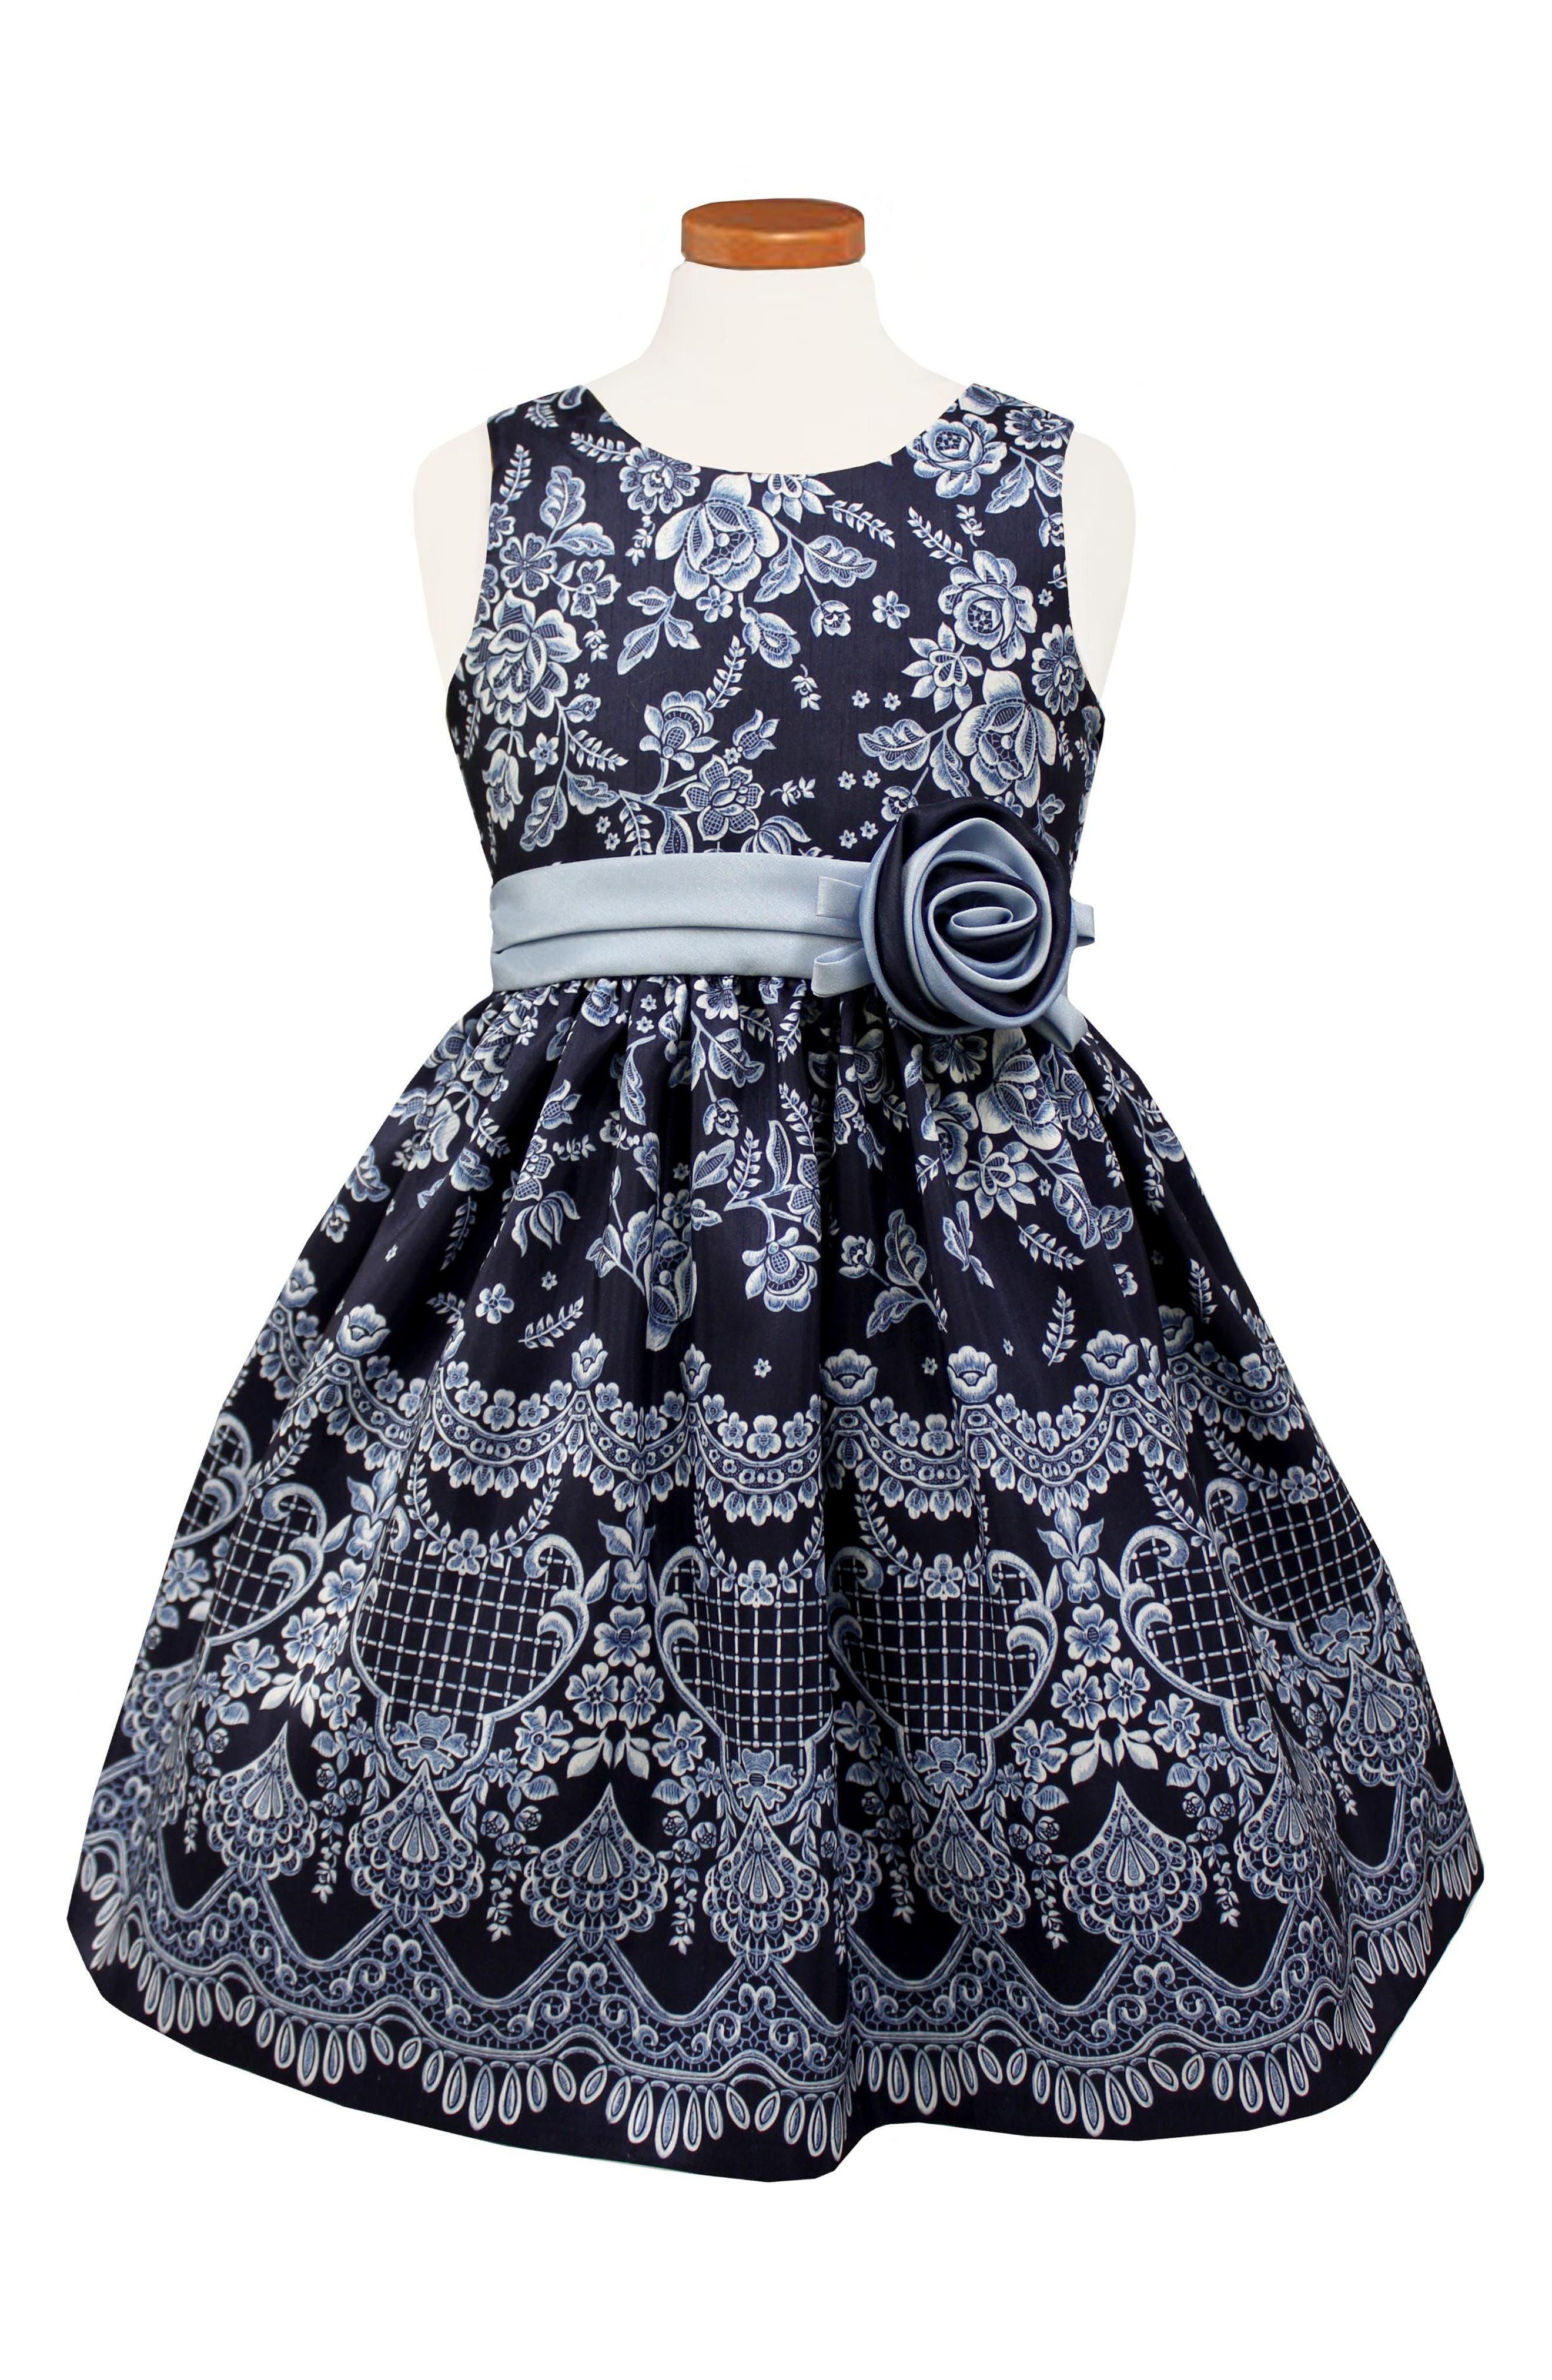 Main Image - Sorbet Floral Print Shantung Dress (Toddler Girls & Little Girls)